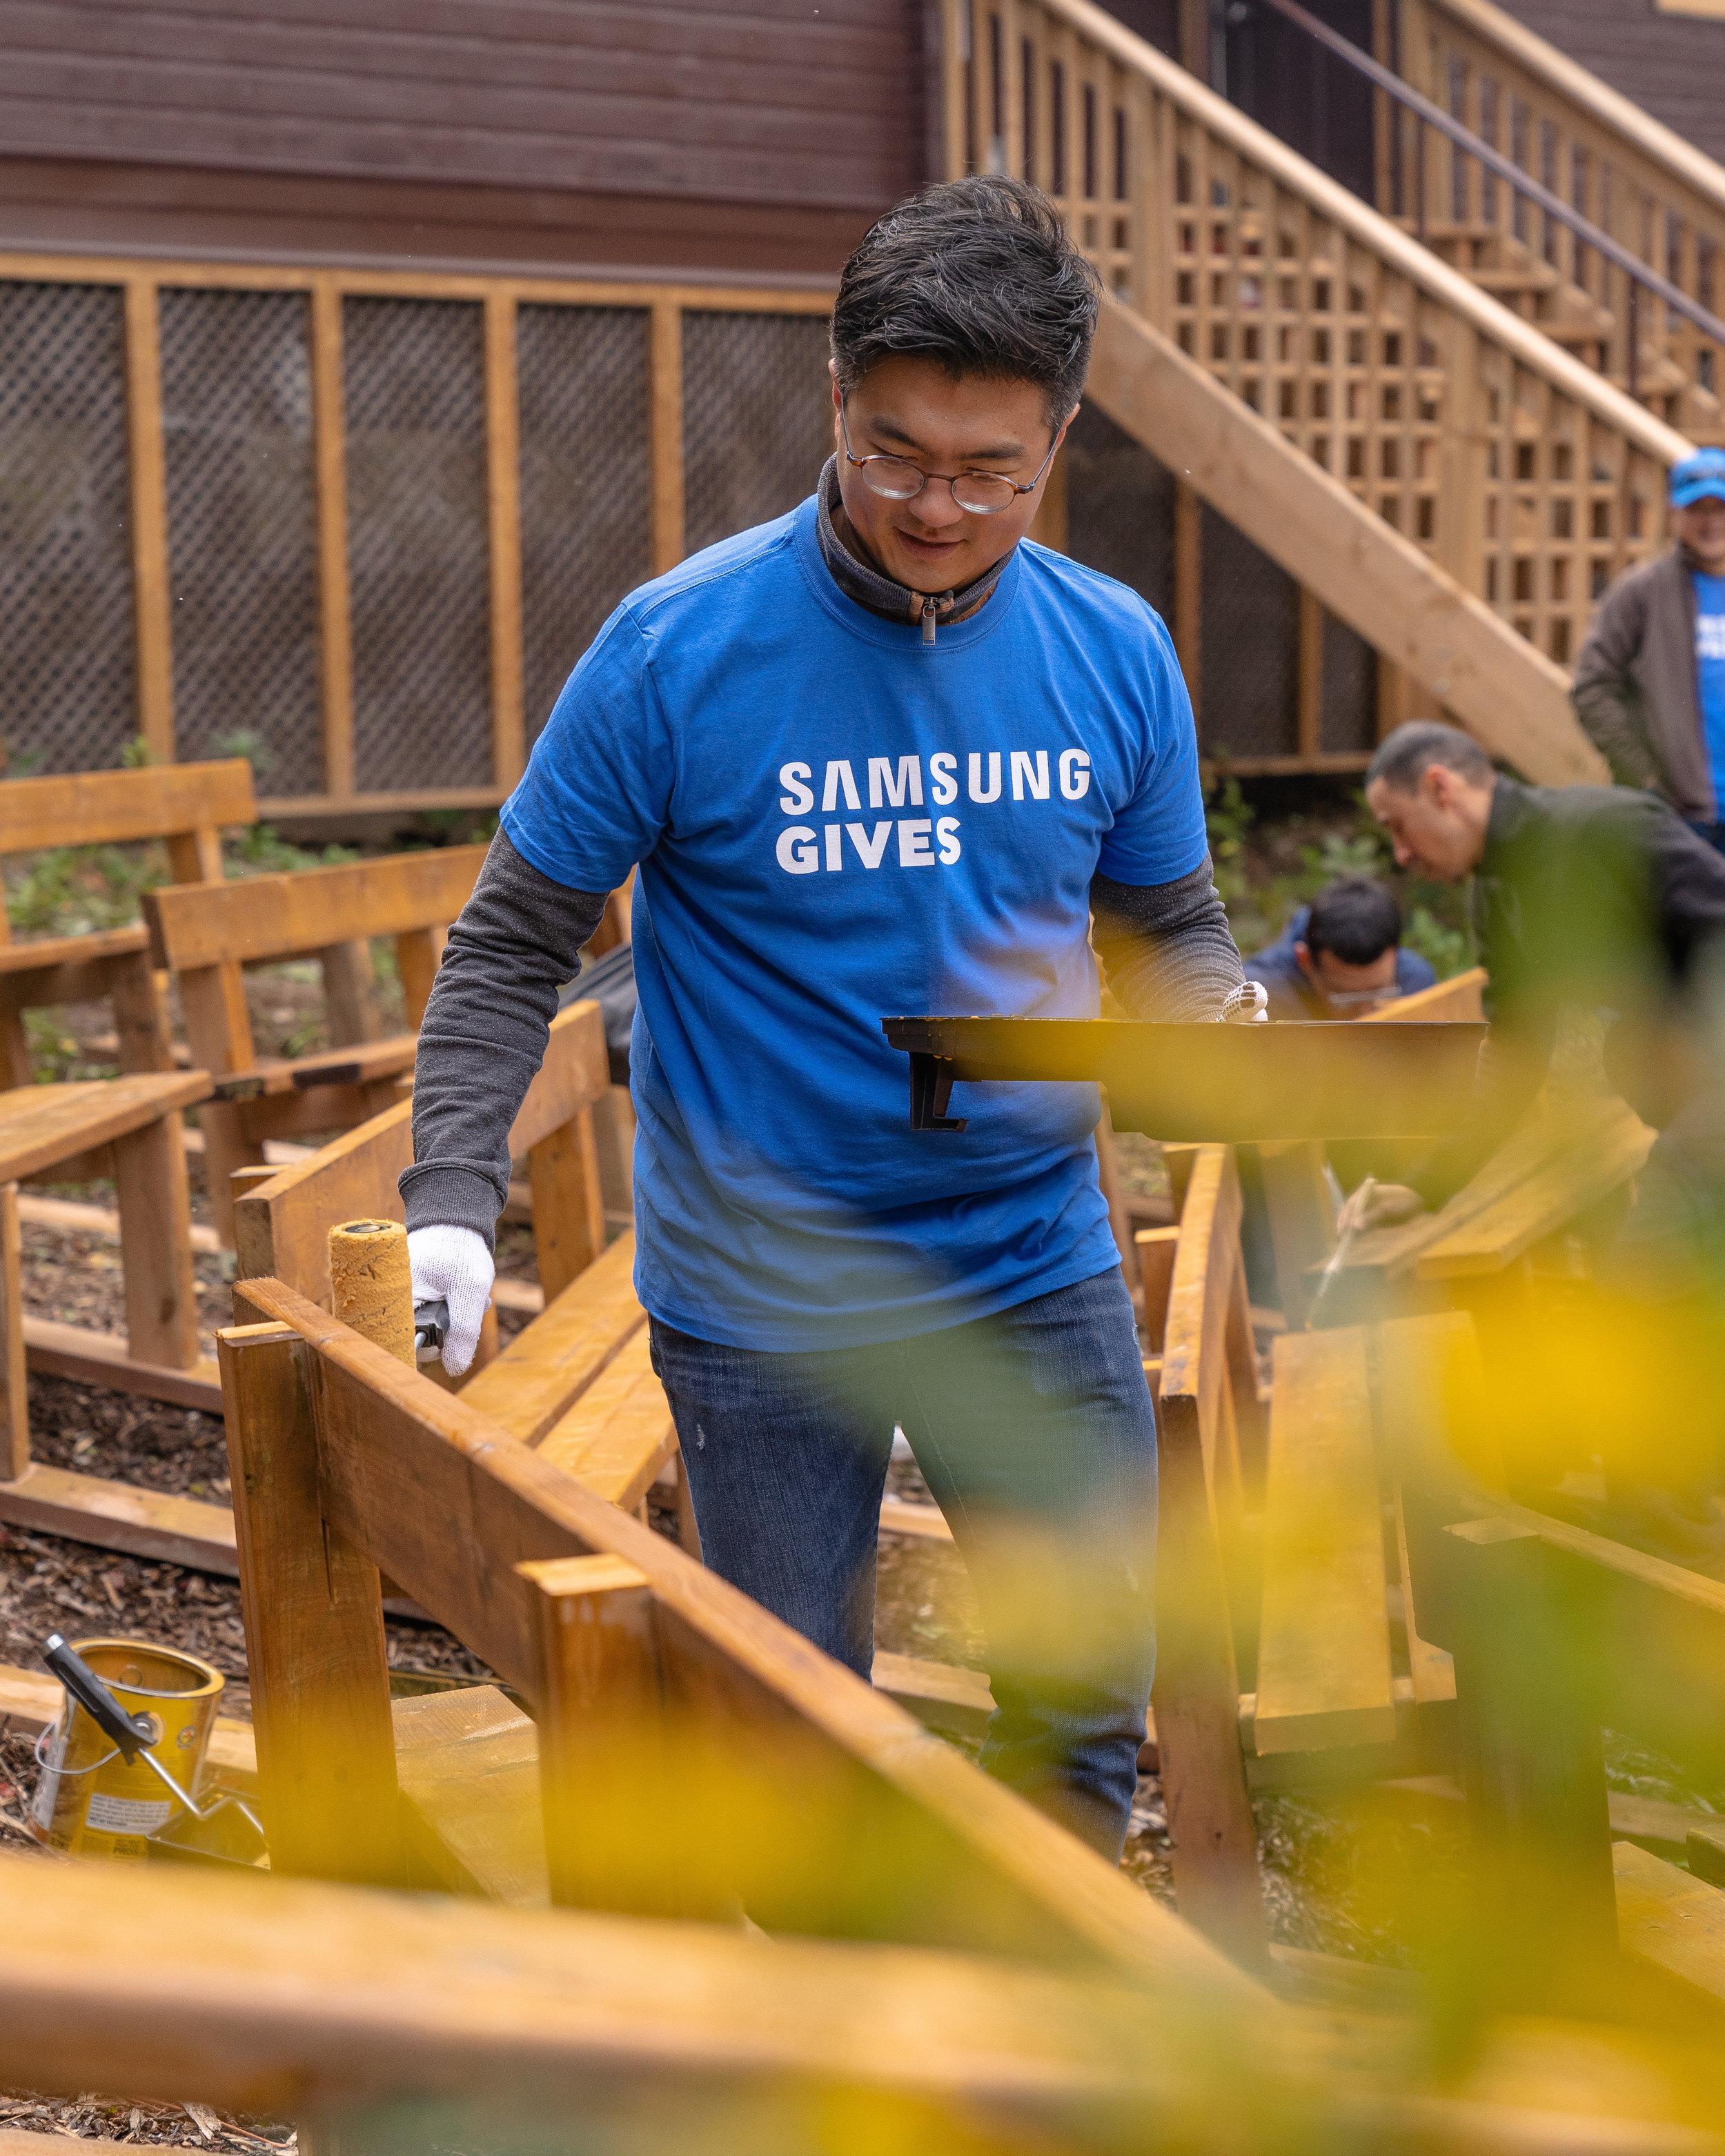 Samsung_Gives-68.JPG